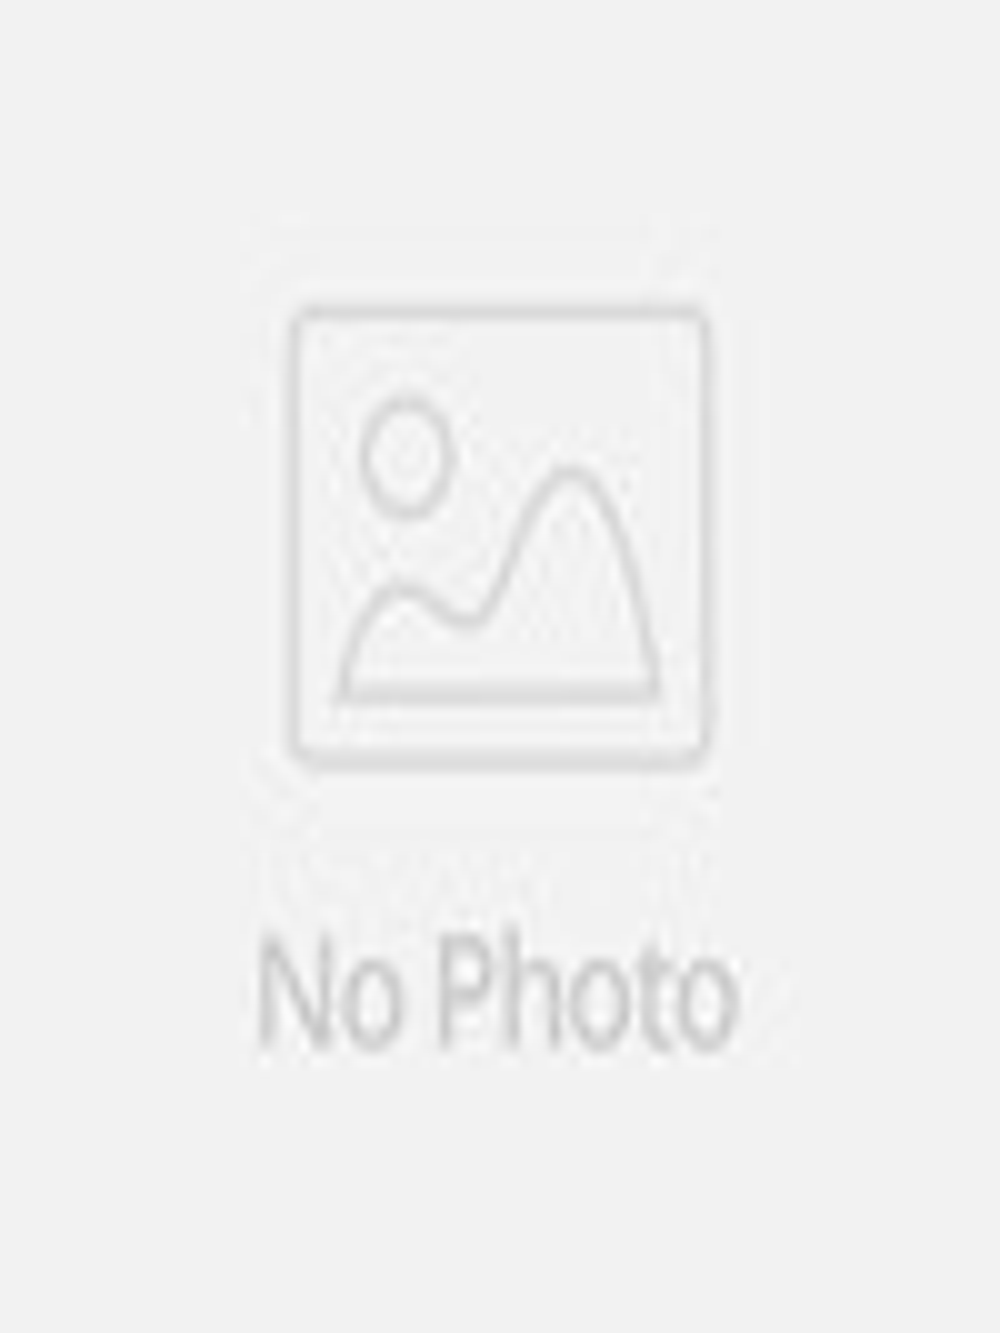 Kids Girls Clothing Sets 2015 Children's Set Snow Queen Cotton Top & Pants Leggings CW-20(China (Mainland))